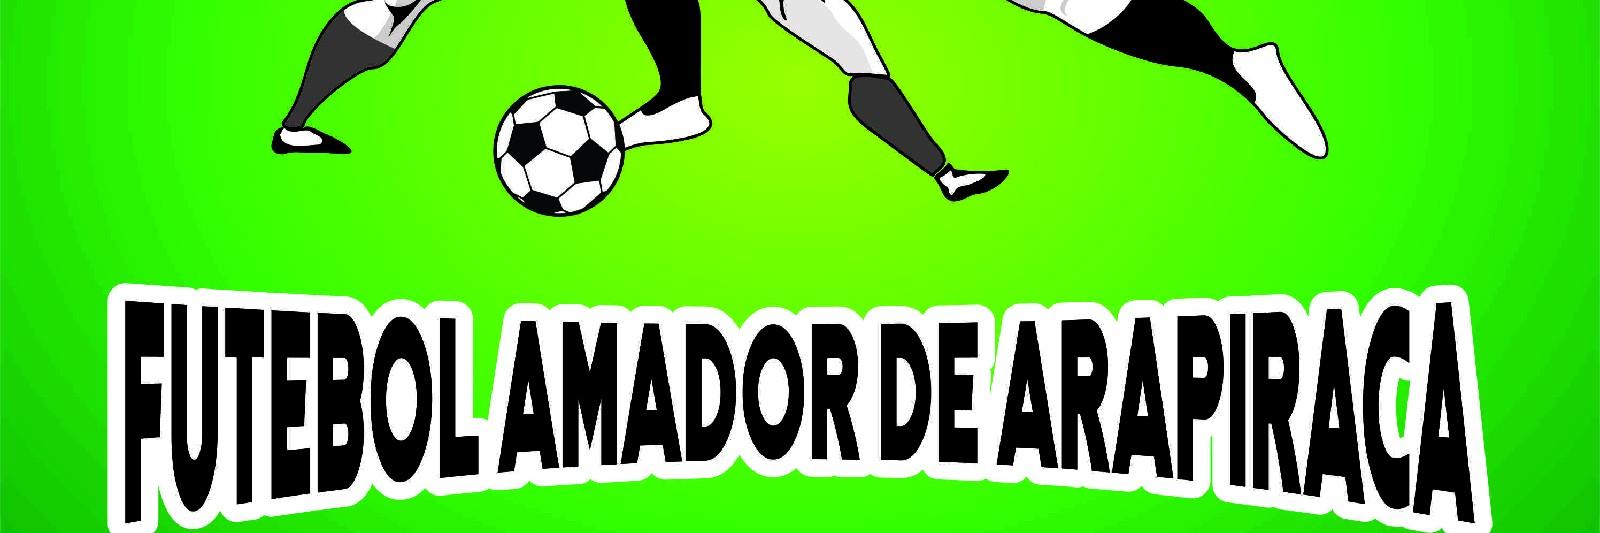 Futebol Amador De Arapiraca 2019